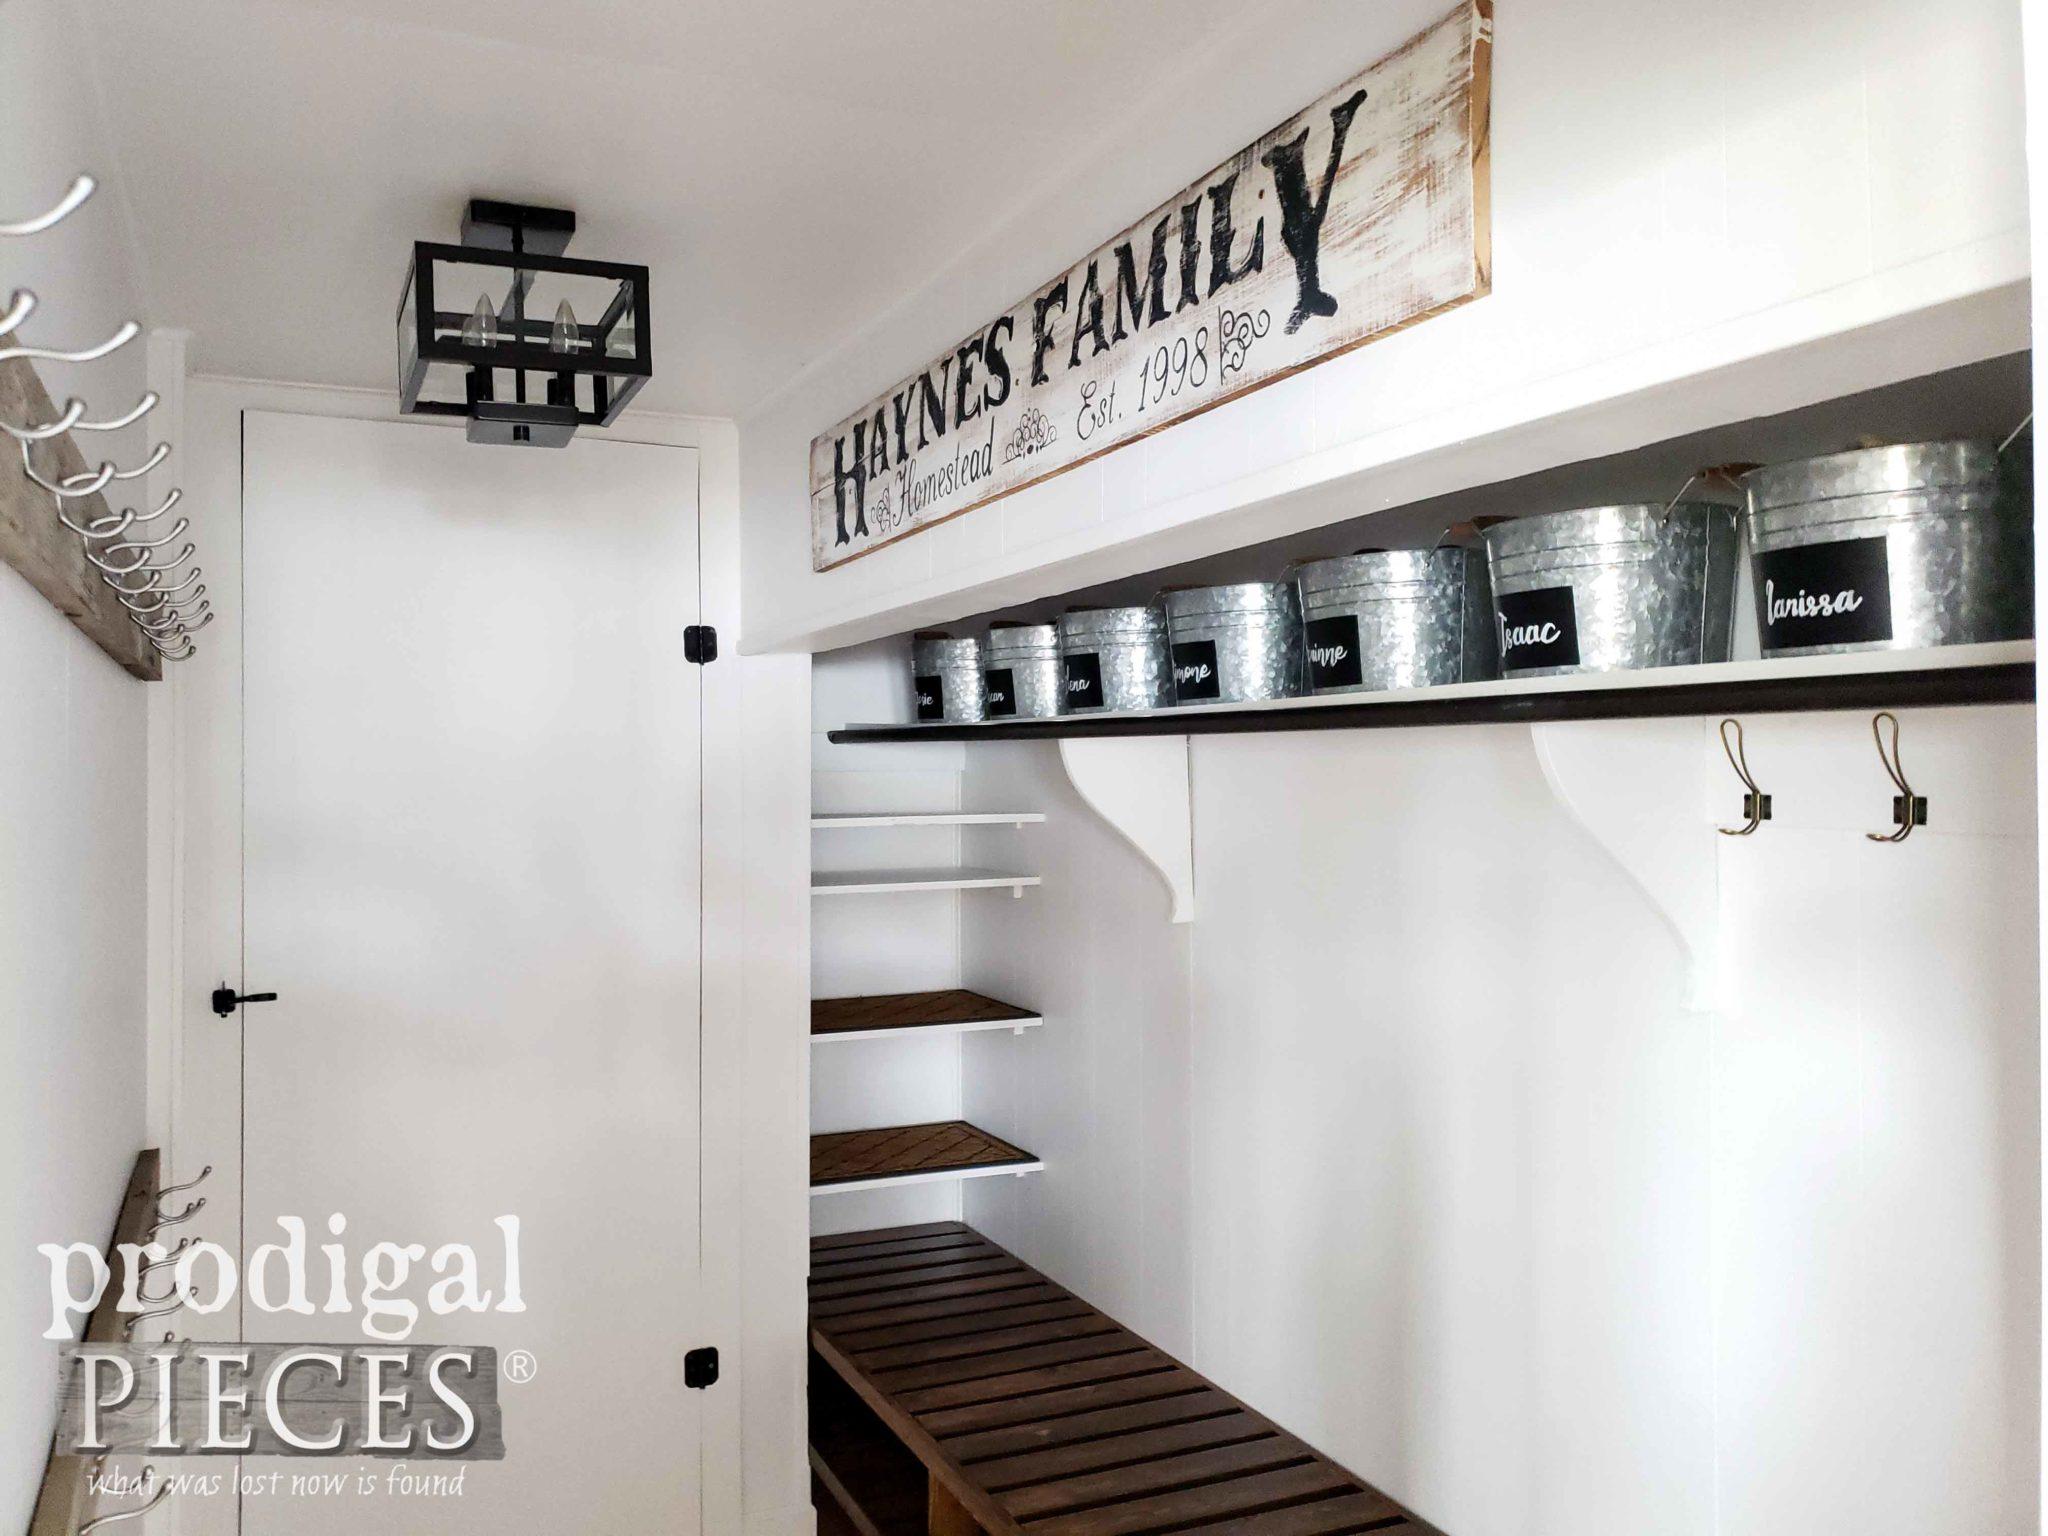 DIY Farmhouse Style Mudroom Storage with DIY Tutorial by Larissa of Prodigal Pieces | prodigalpieces.com #prodigalpieces #diy #home #homedecor #storage #farmhouse